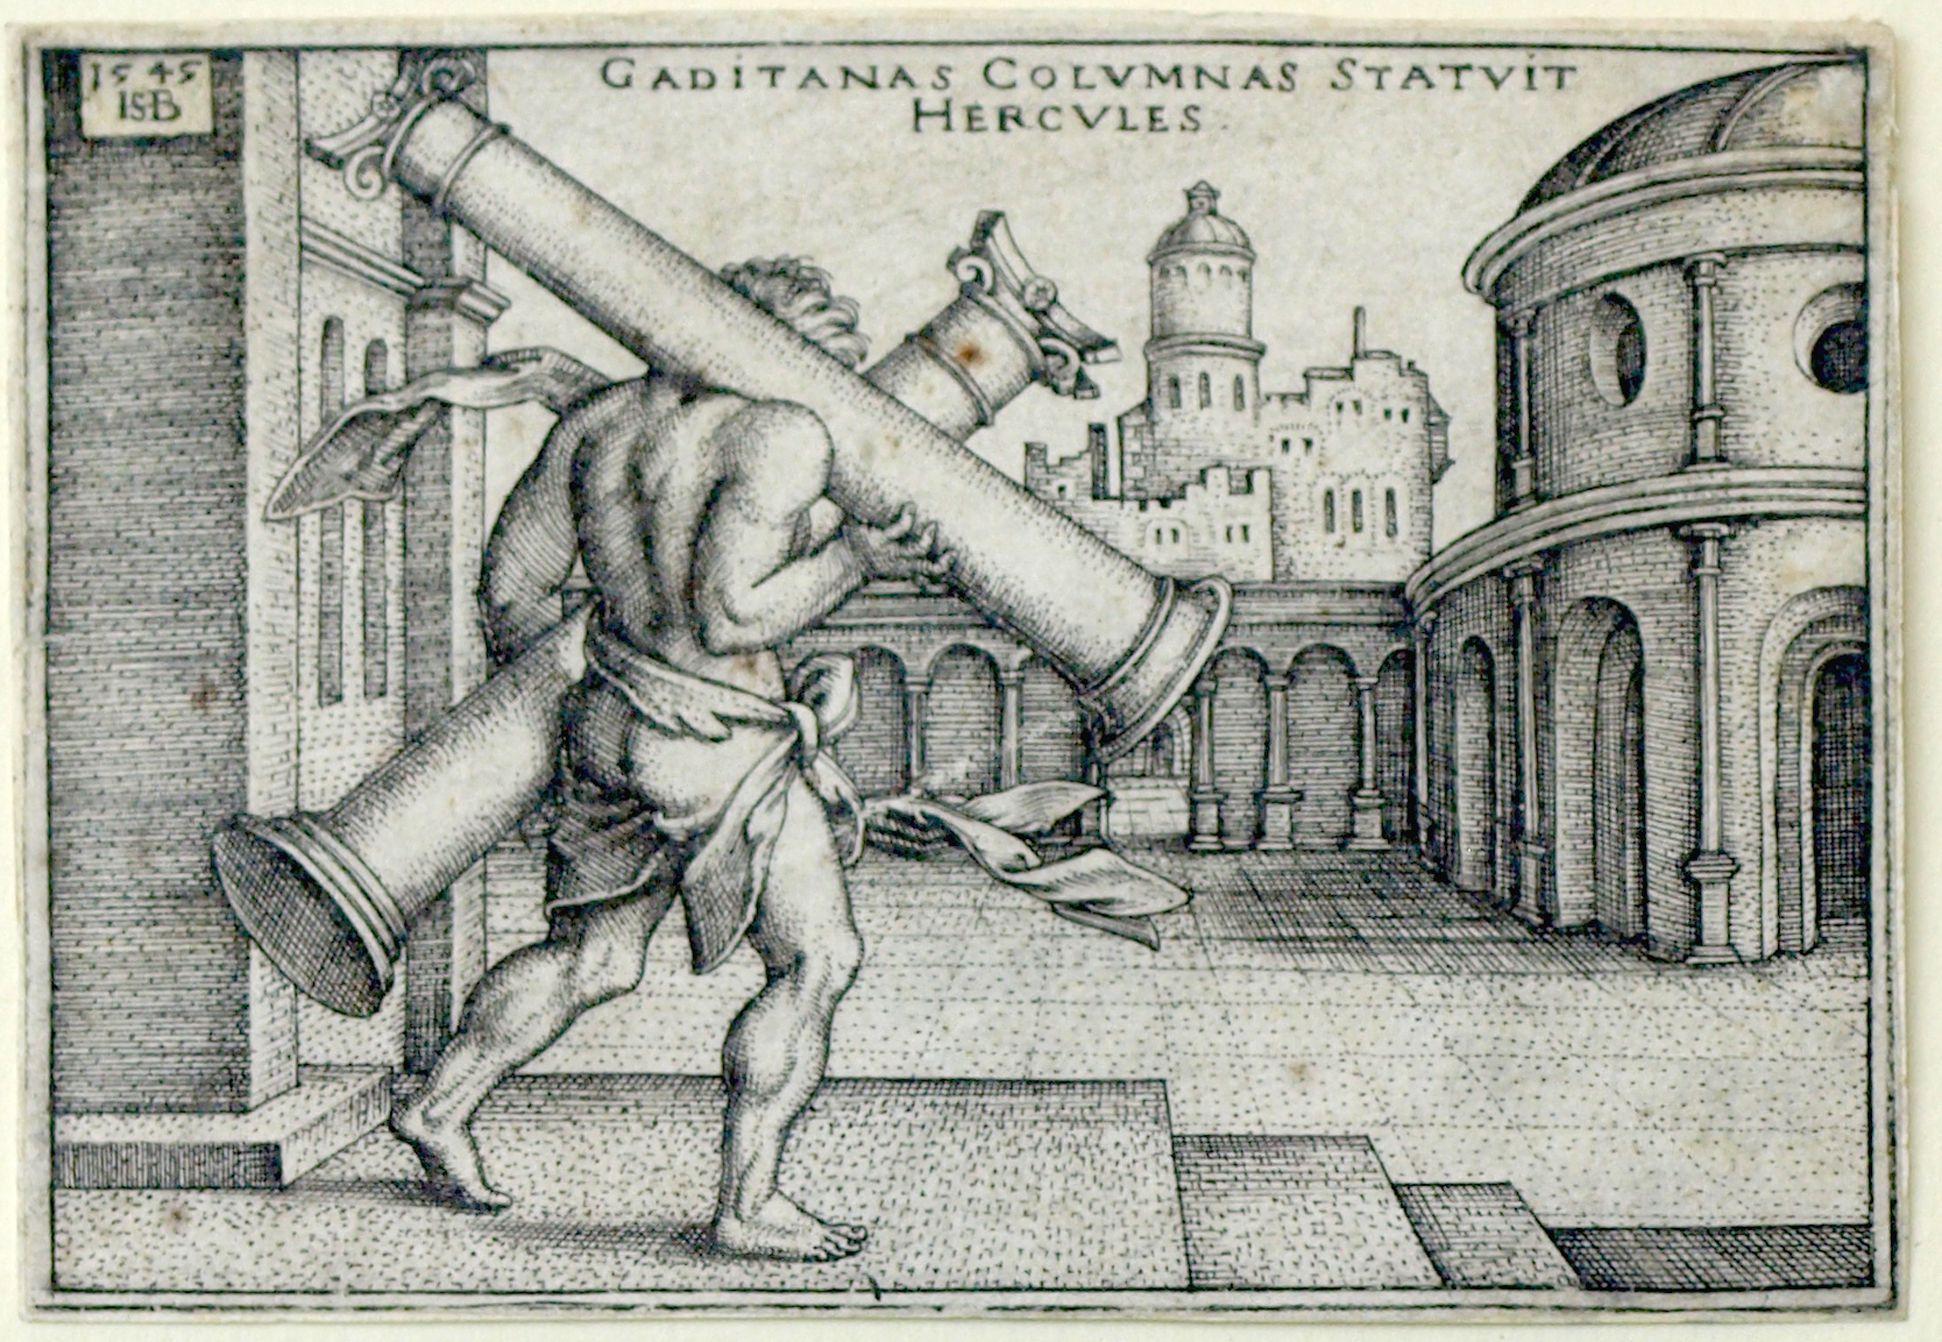 The deeds of Hercules Hercules erects the pillars of Gades, 1545, 48x70mm